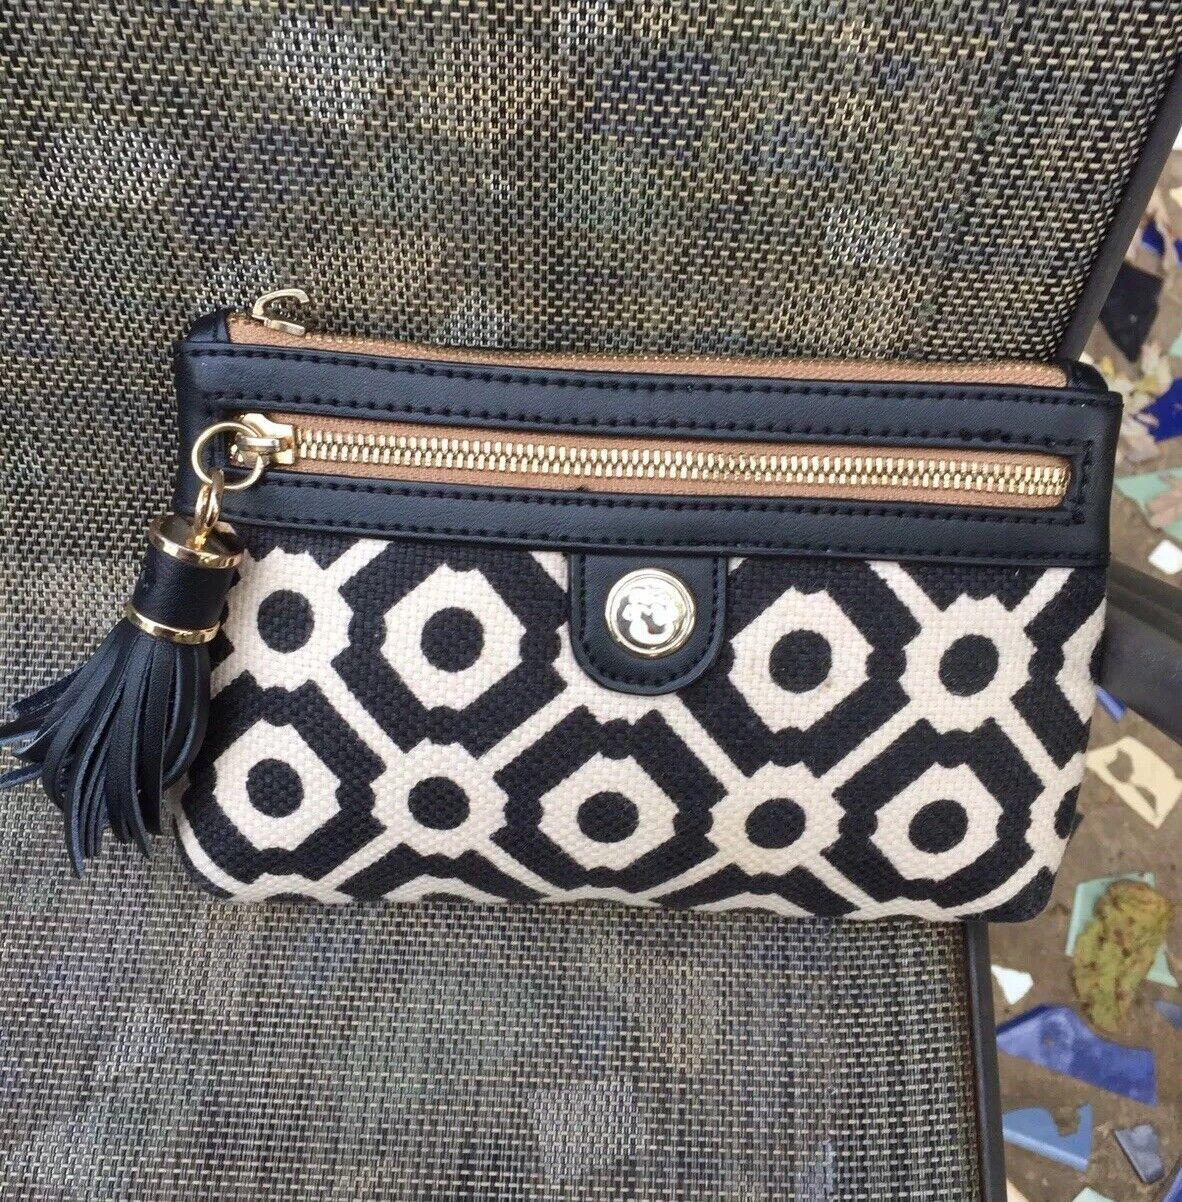 SPARTINA DAUFUSKIE ISLAND Black/white canvas w/black leather trim clutch 8